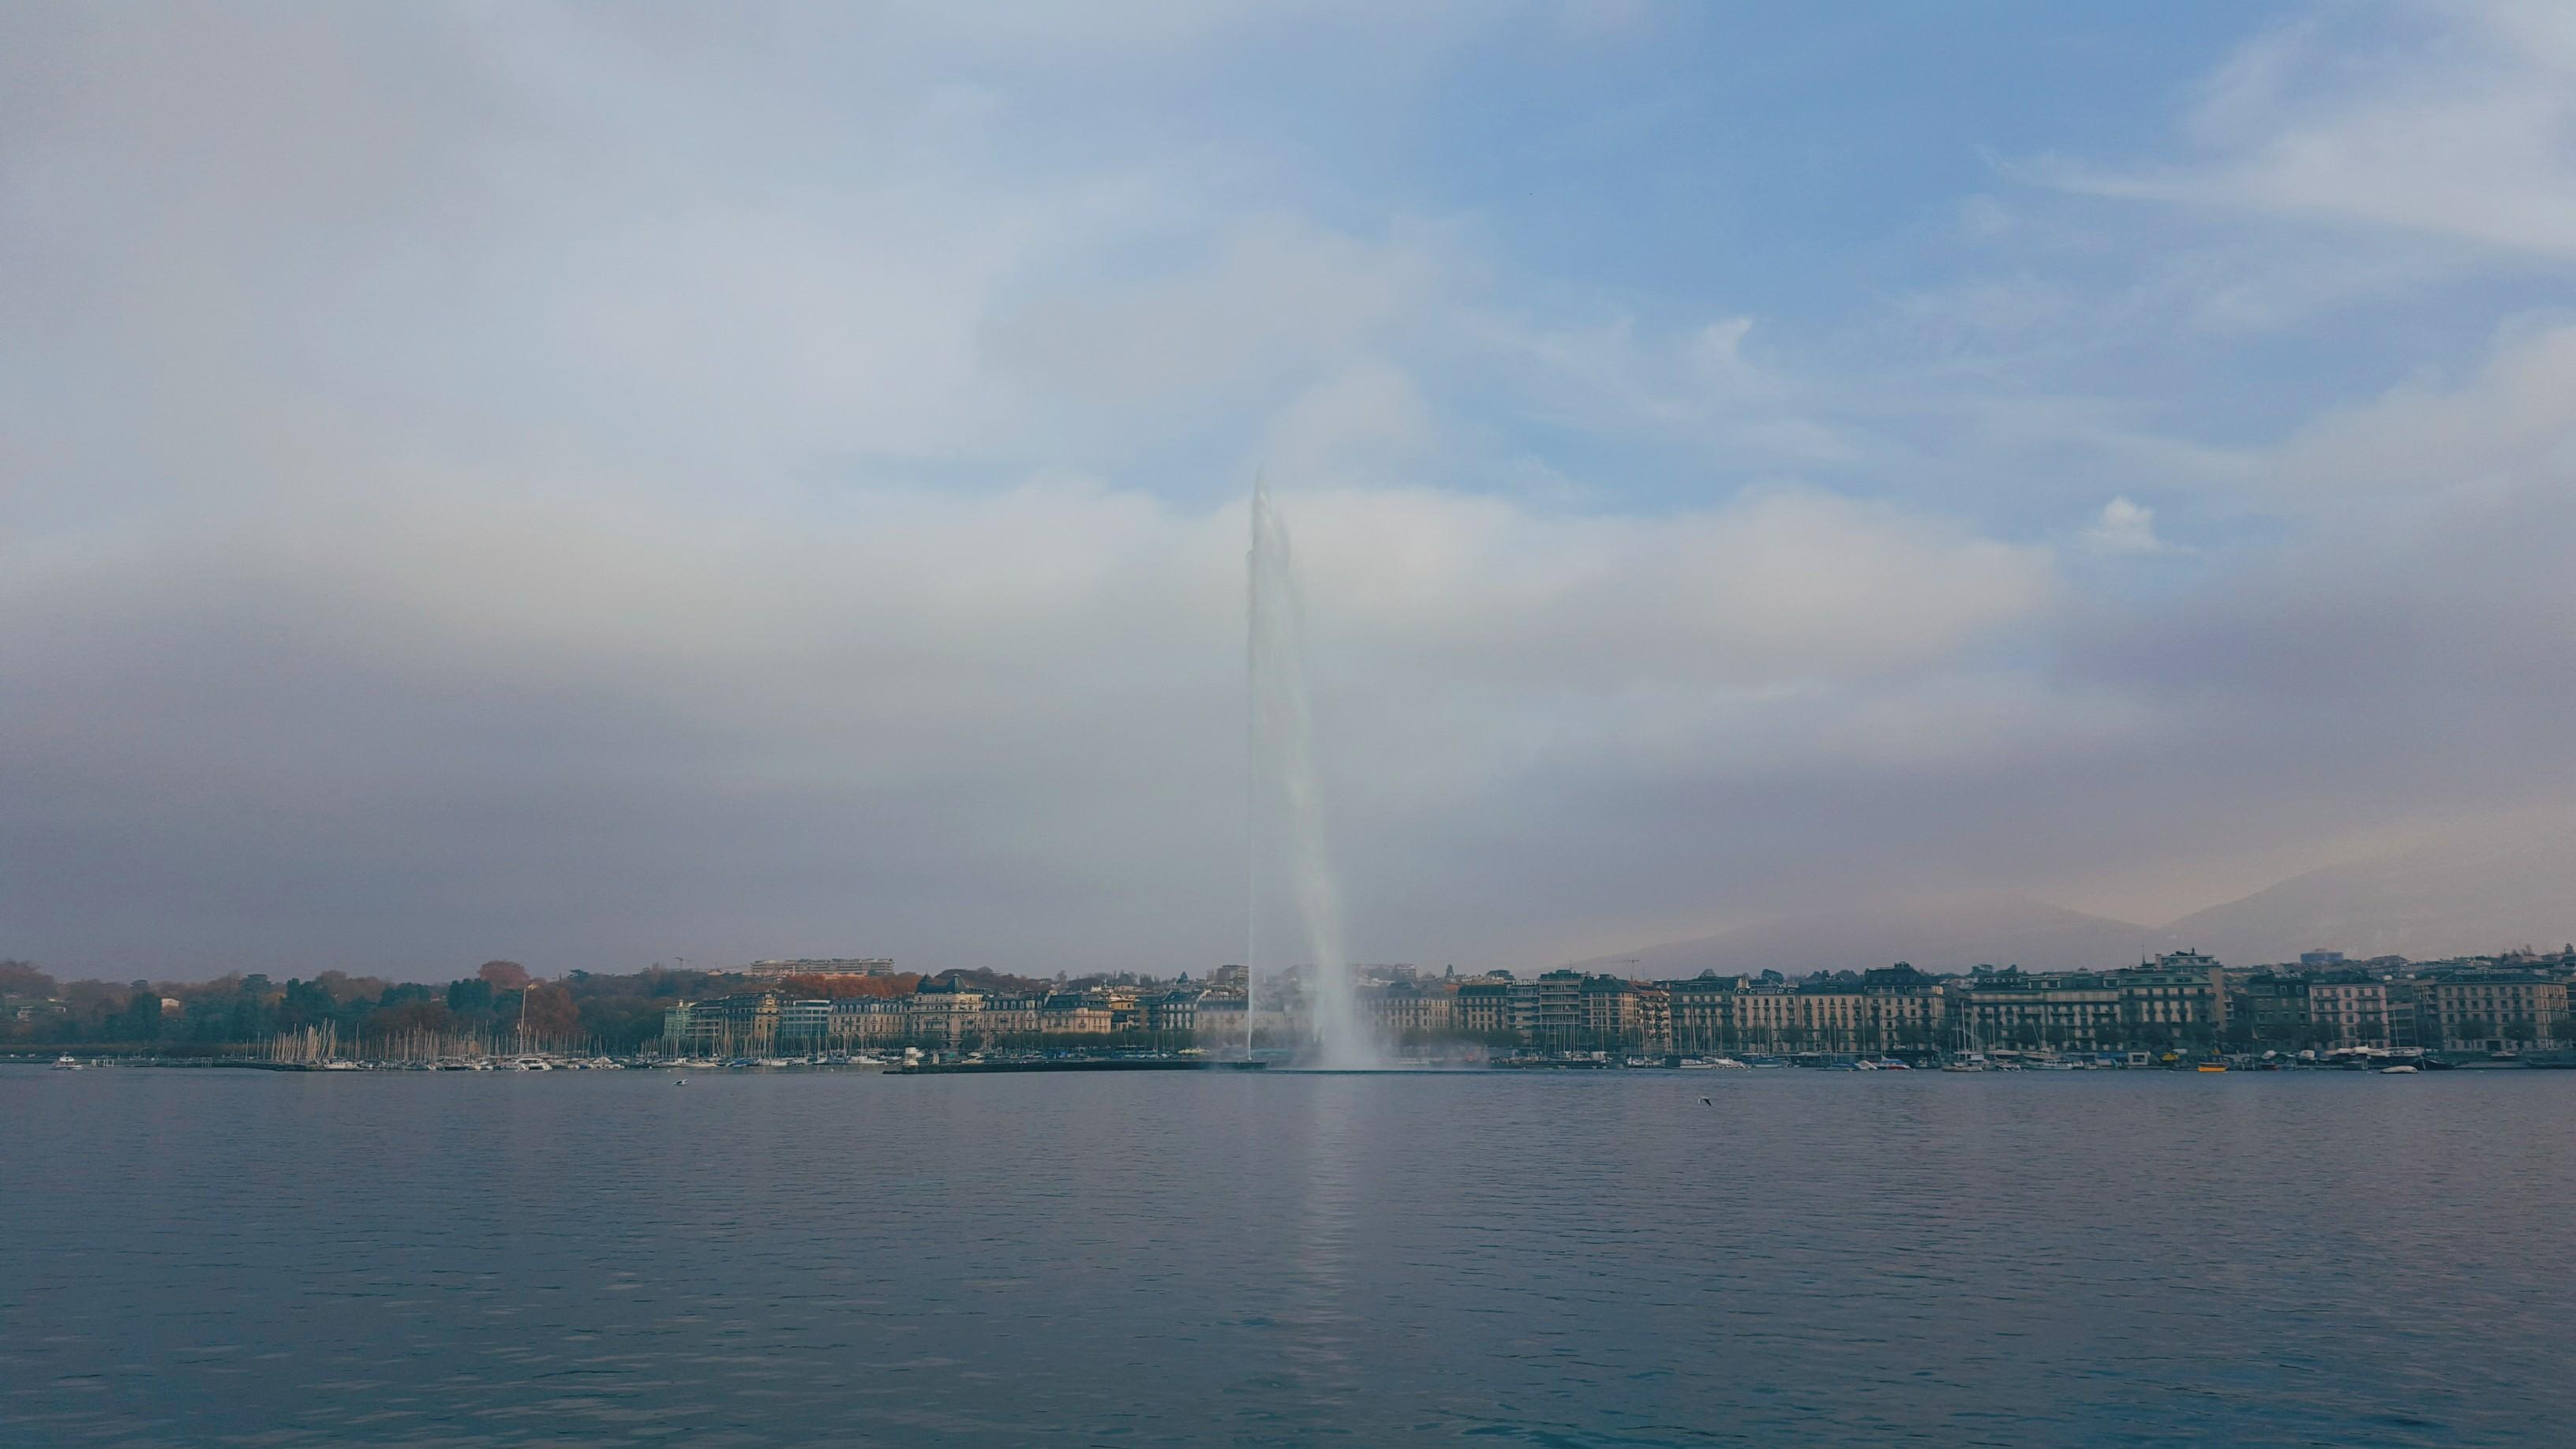 General 3264x1836 photography sky city cityscape landscape water Geneva architecture Switzerland mountains